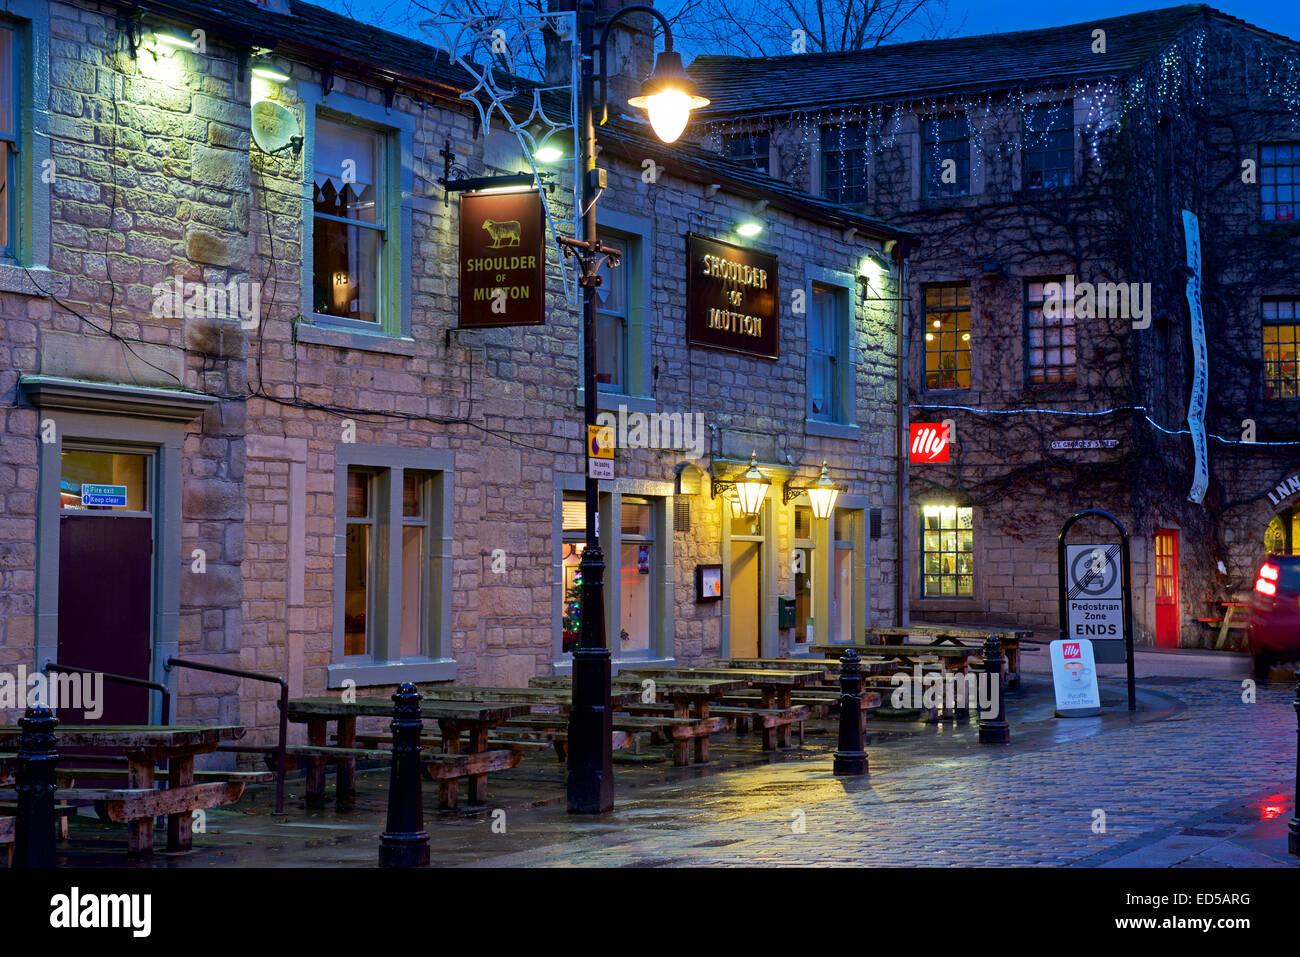 Paletilla de Cordero, pub Hebden Bridge, Calderdale, West Yorkshire, Inglaterra Imagen De Stock